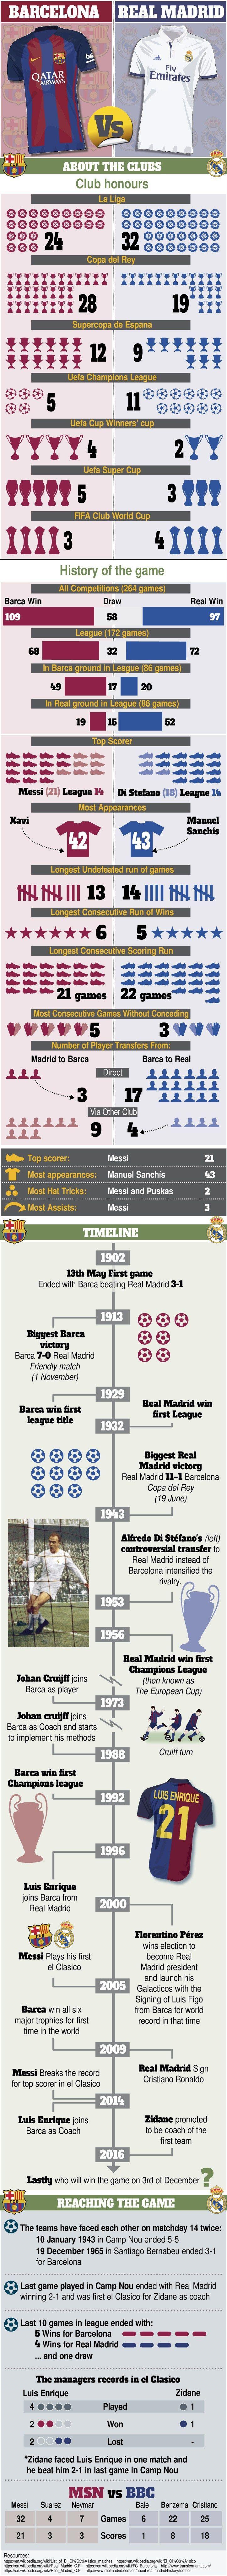 infographic: El Clasico Barcelona vs Real Madrid www.mysoccerhq.com